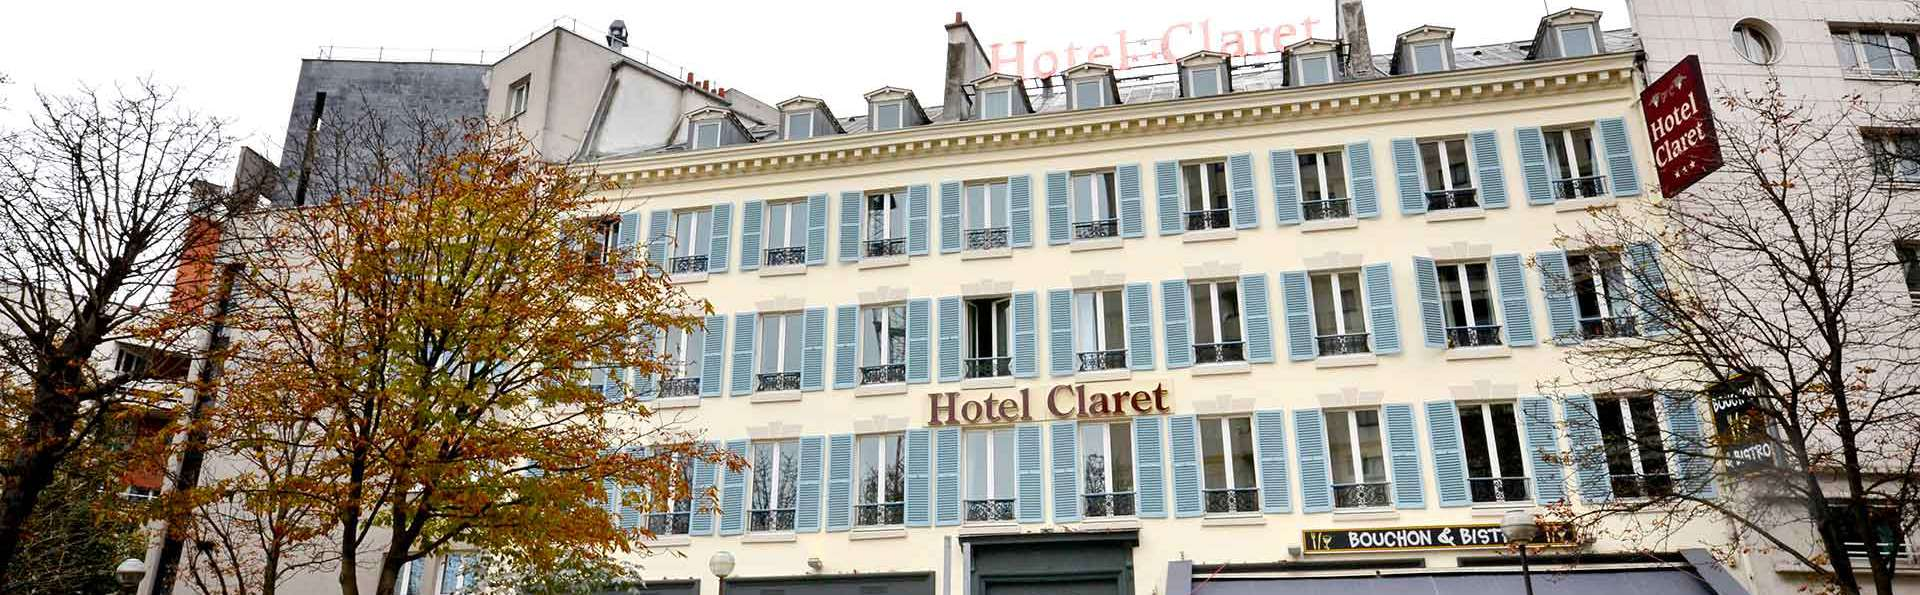 Hôtel Claret Bercy - Edit_Front2.jpg